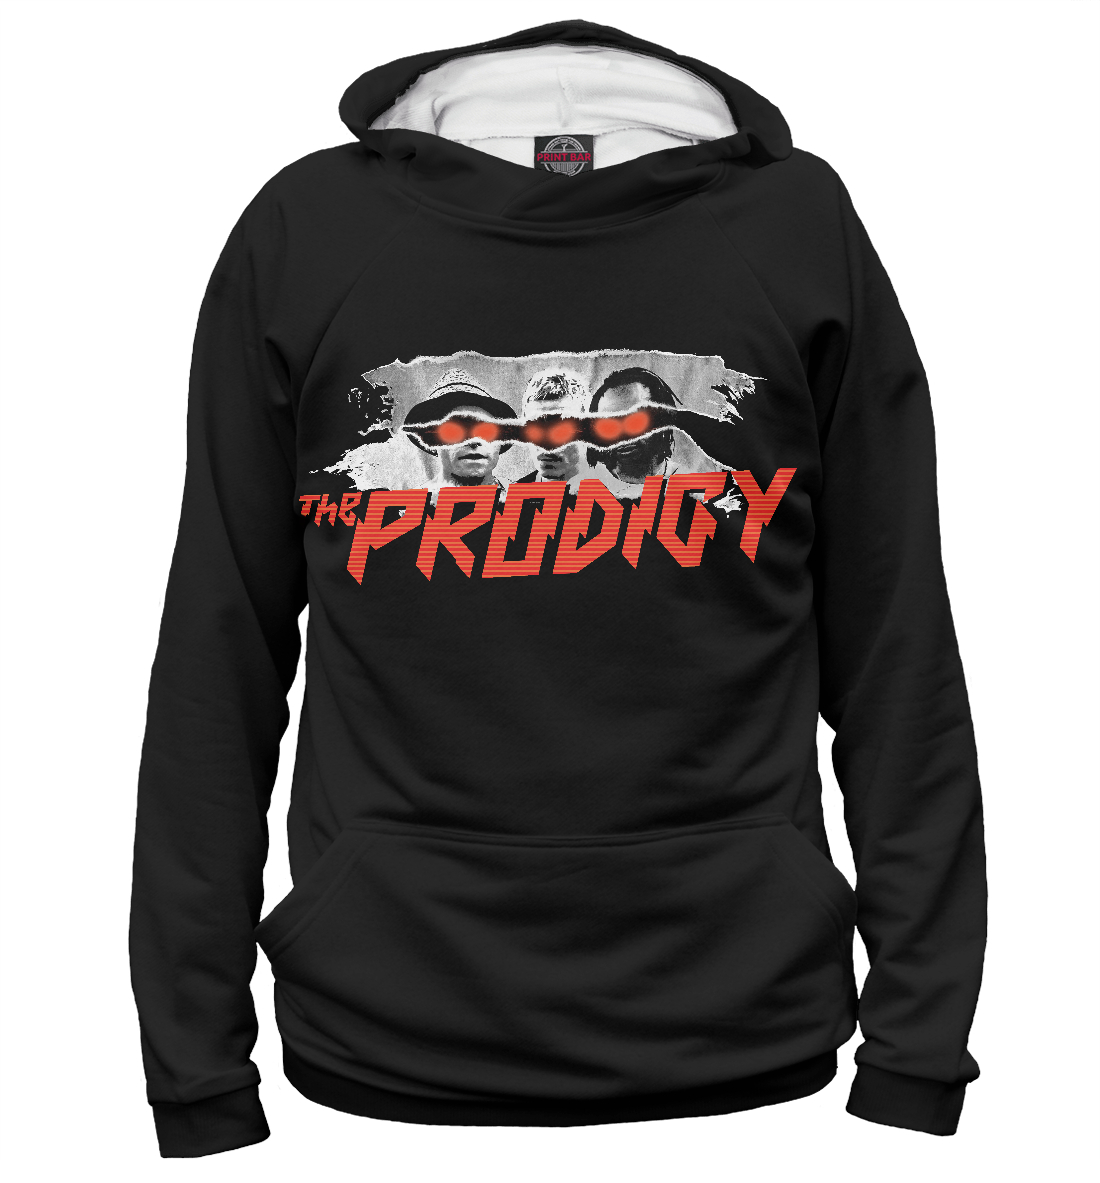 Купить The Prodigy: Invaders Tour, Printbar, Худи, THE-780351-hud-2